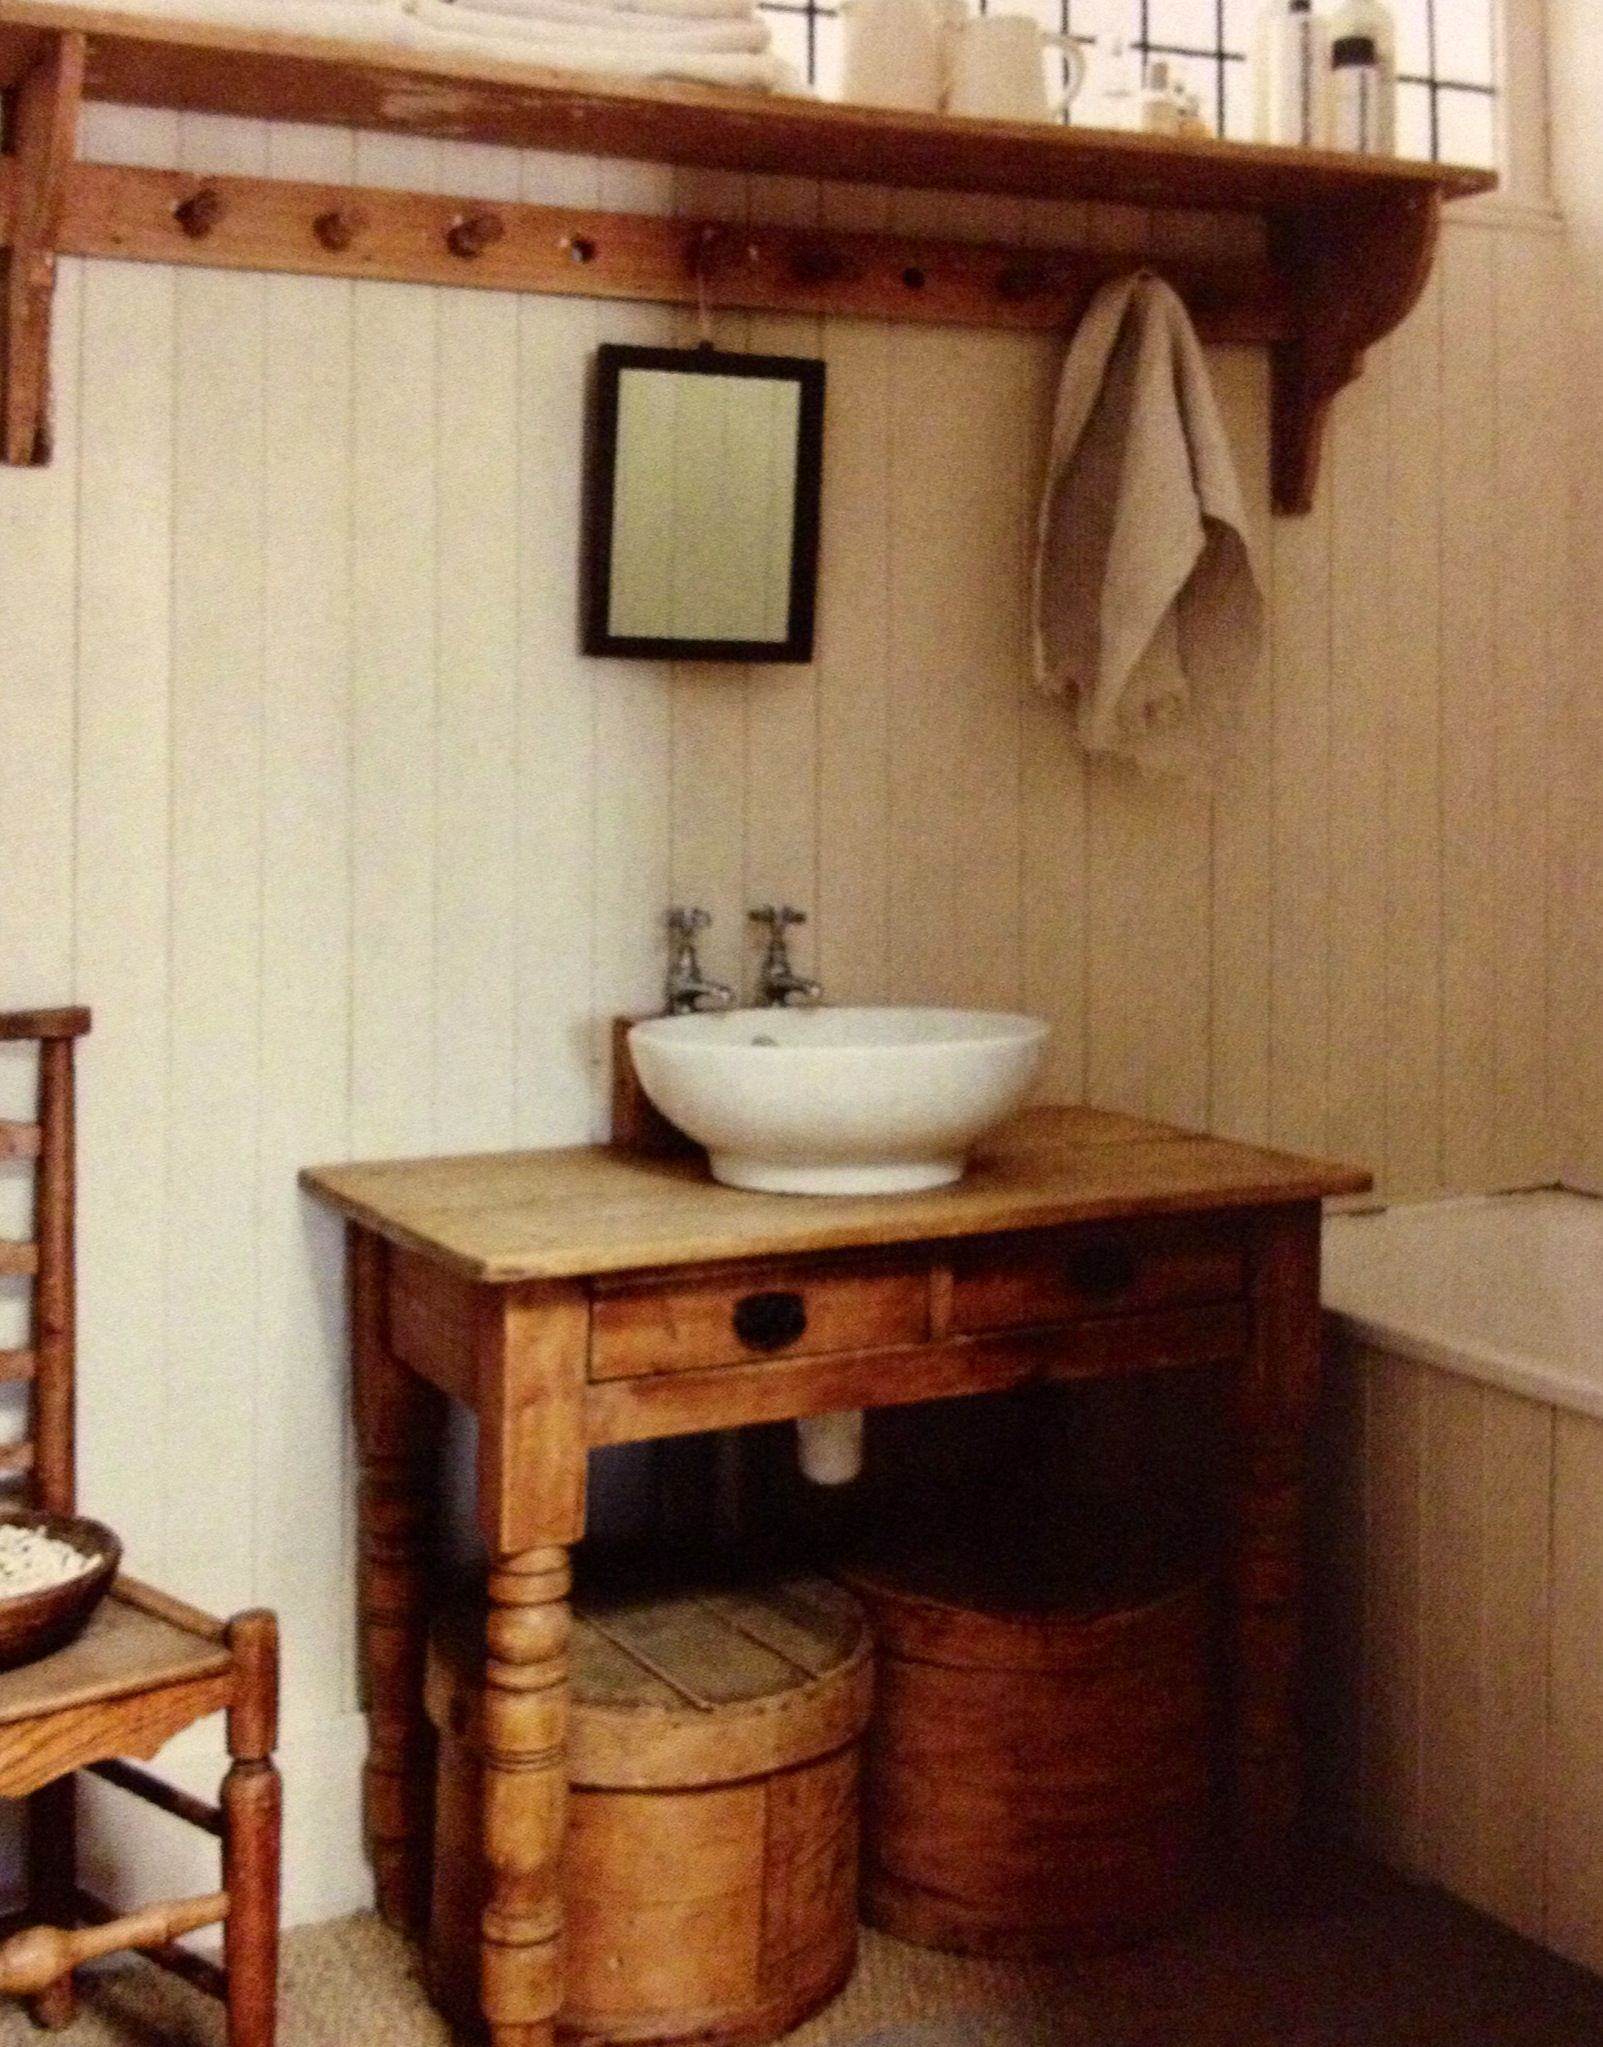 Wood Panels And Shaker Pegs Shelf Room Design By Alex Legendre Feature In Sainsbury S Magazine Mar Rustic Bathroom Vanities Rustic Bathrooms Bathroom Design